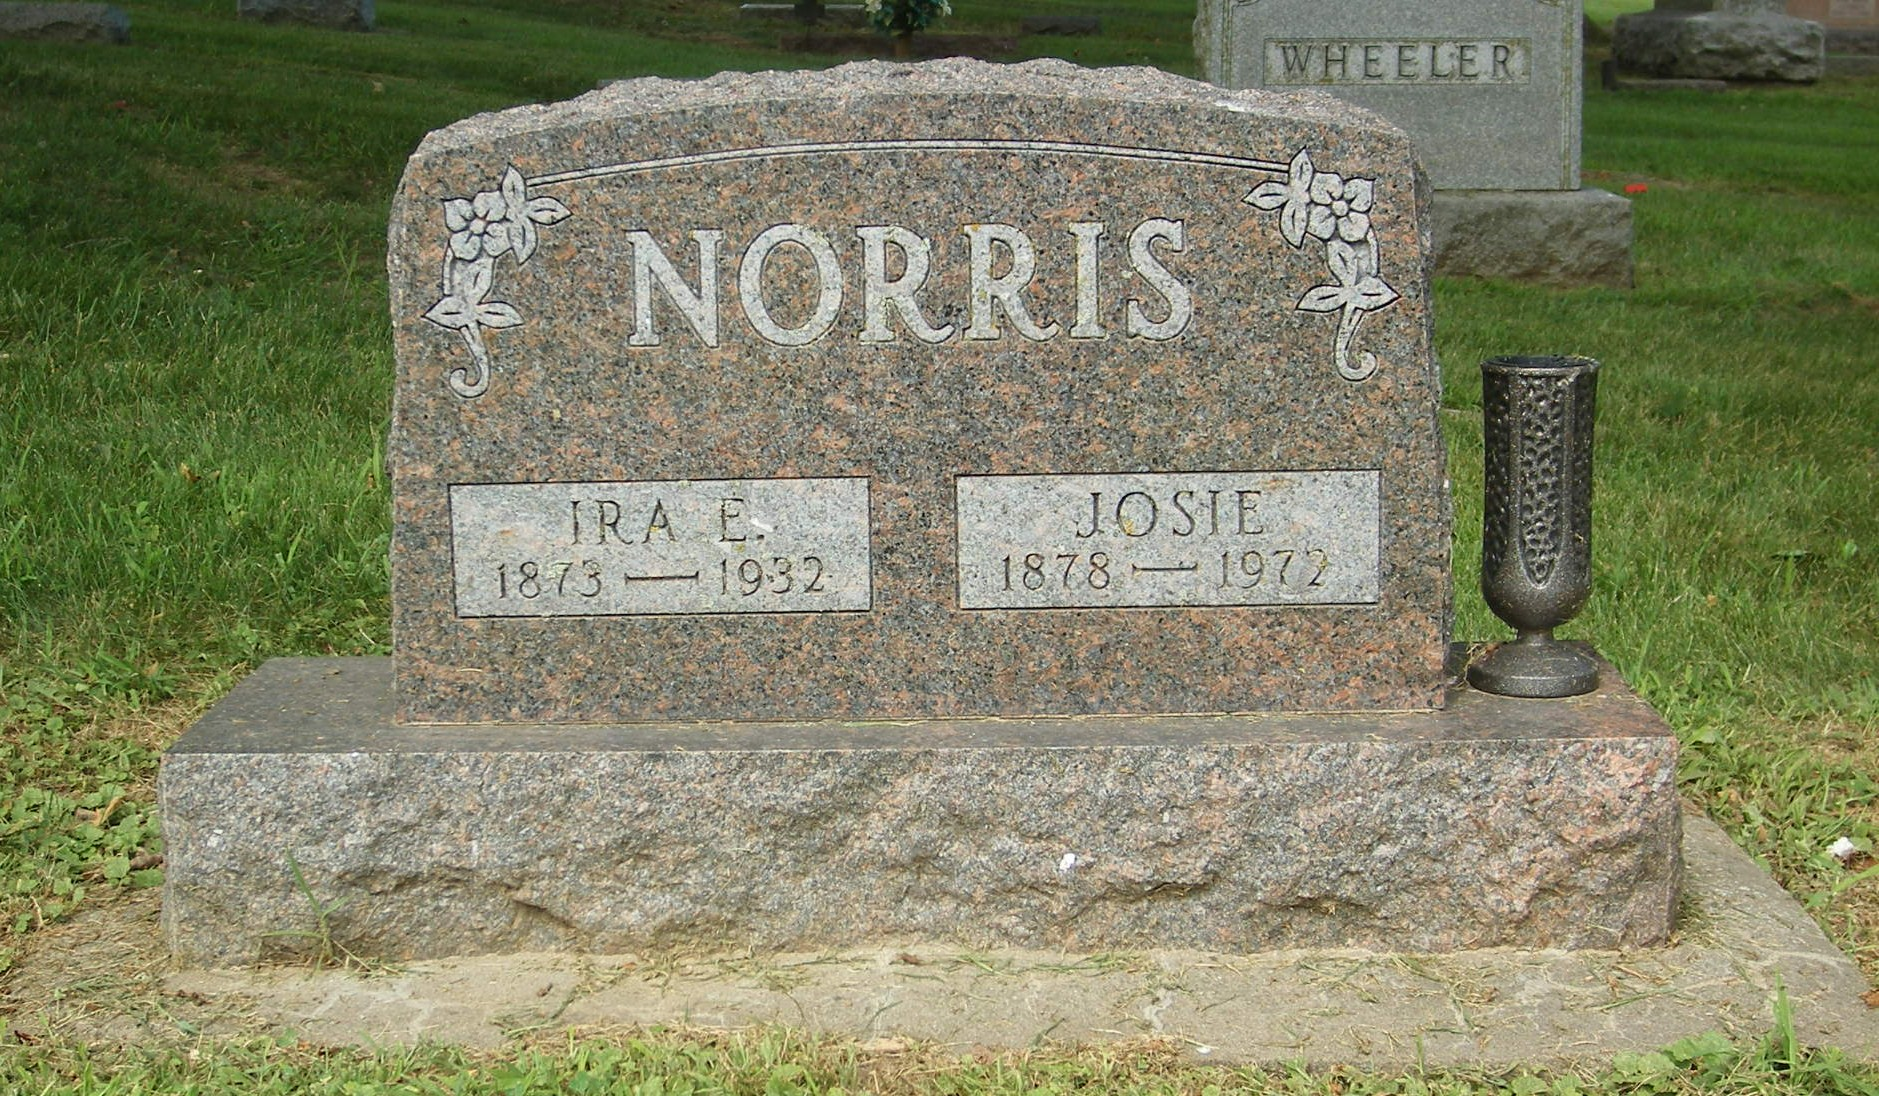 I E Norris